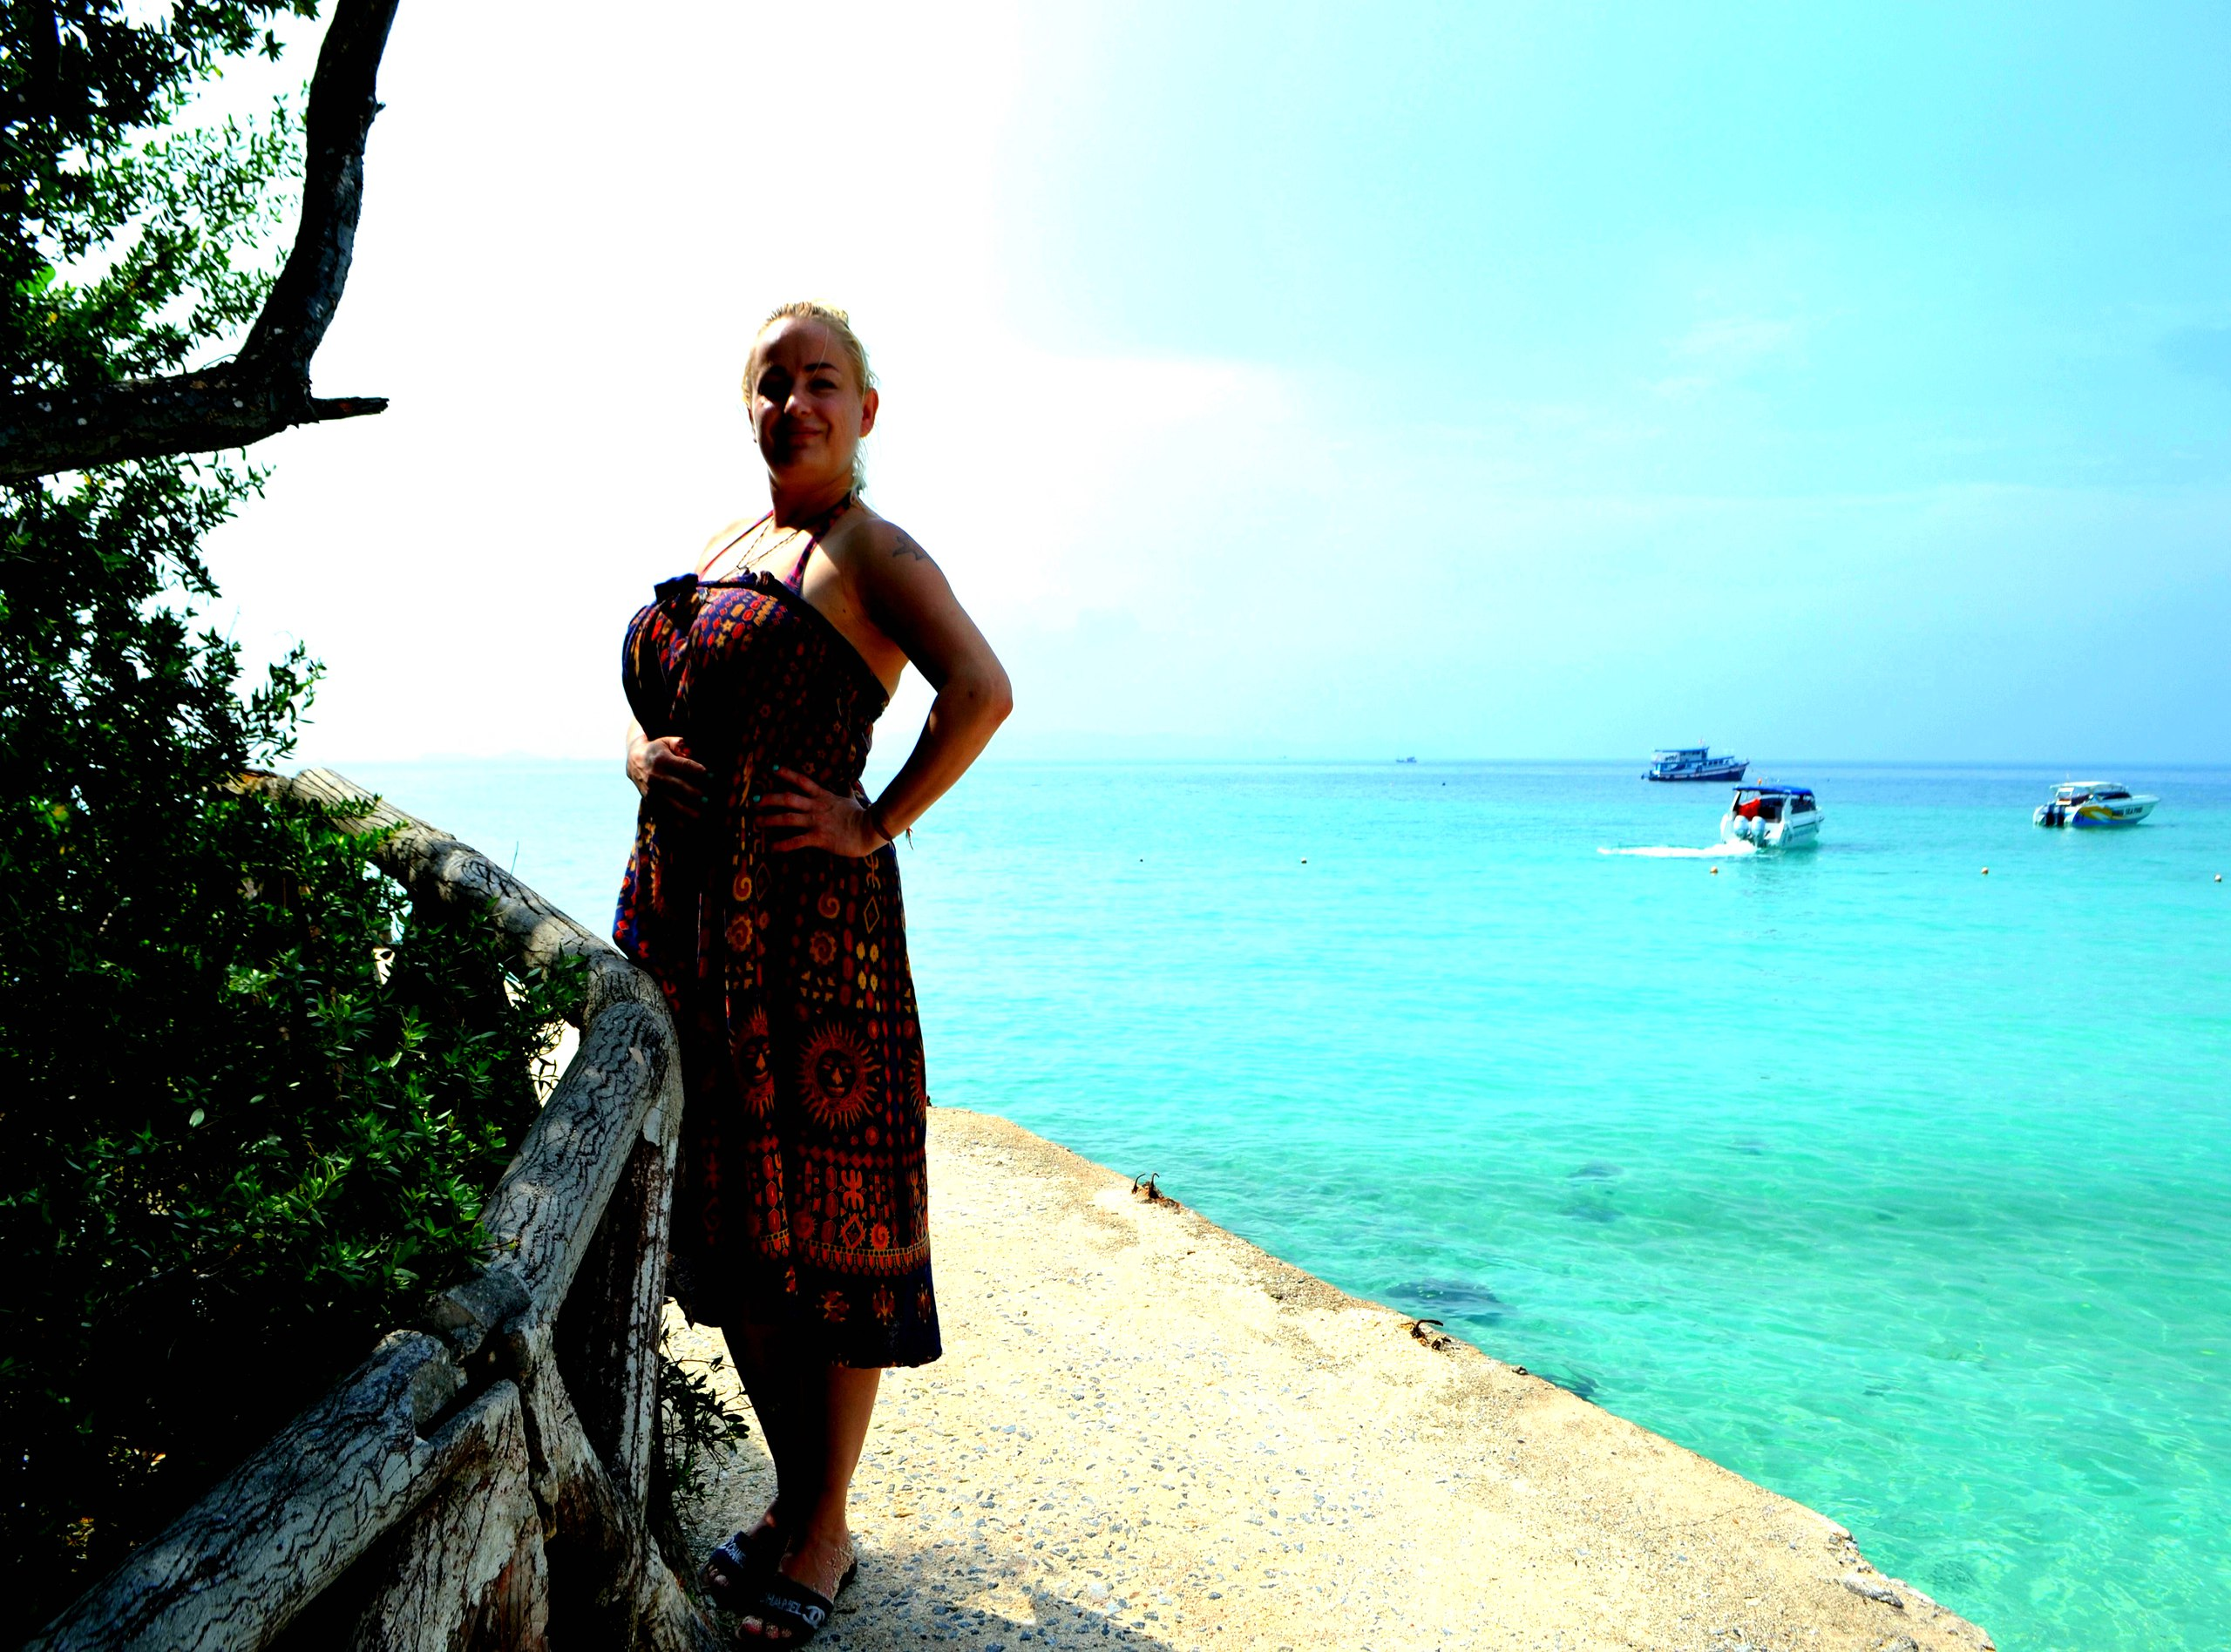 Елена Руденко ( Валтея ). Таиланд. Остров Ко Лан. Peojux-J4K8